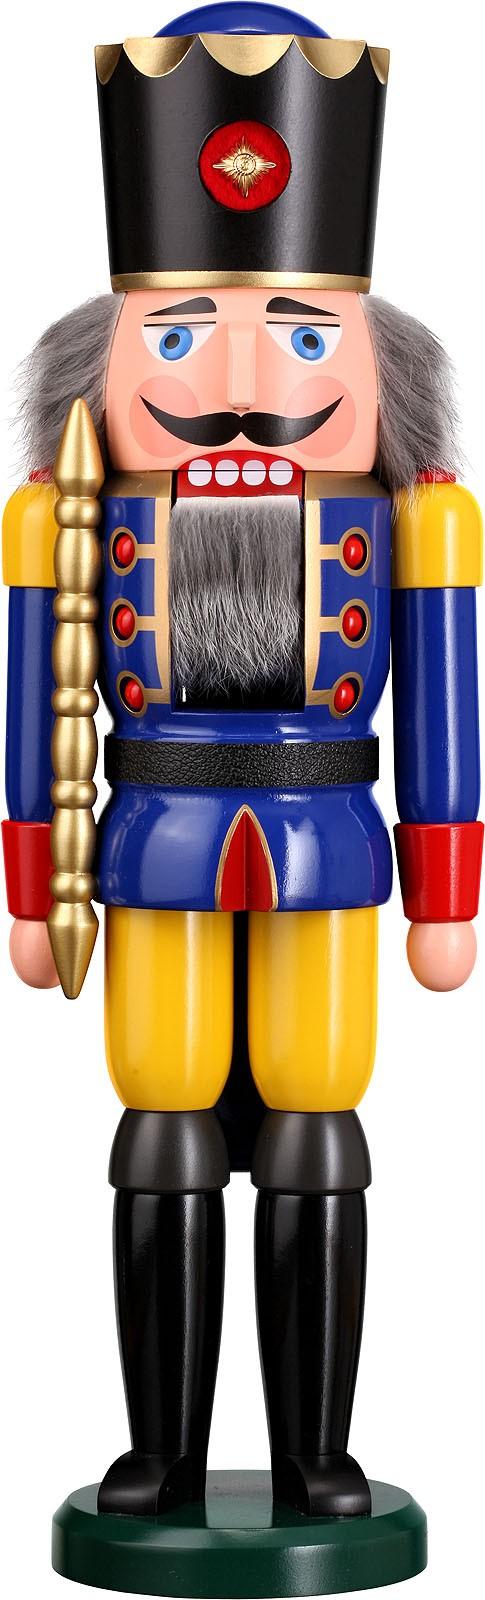 Nussknacker König, blau, 50 cm